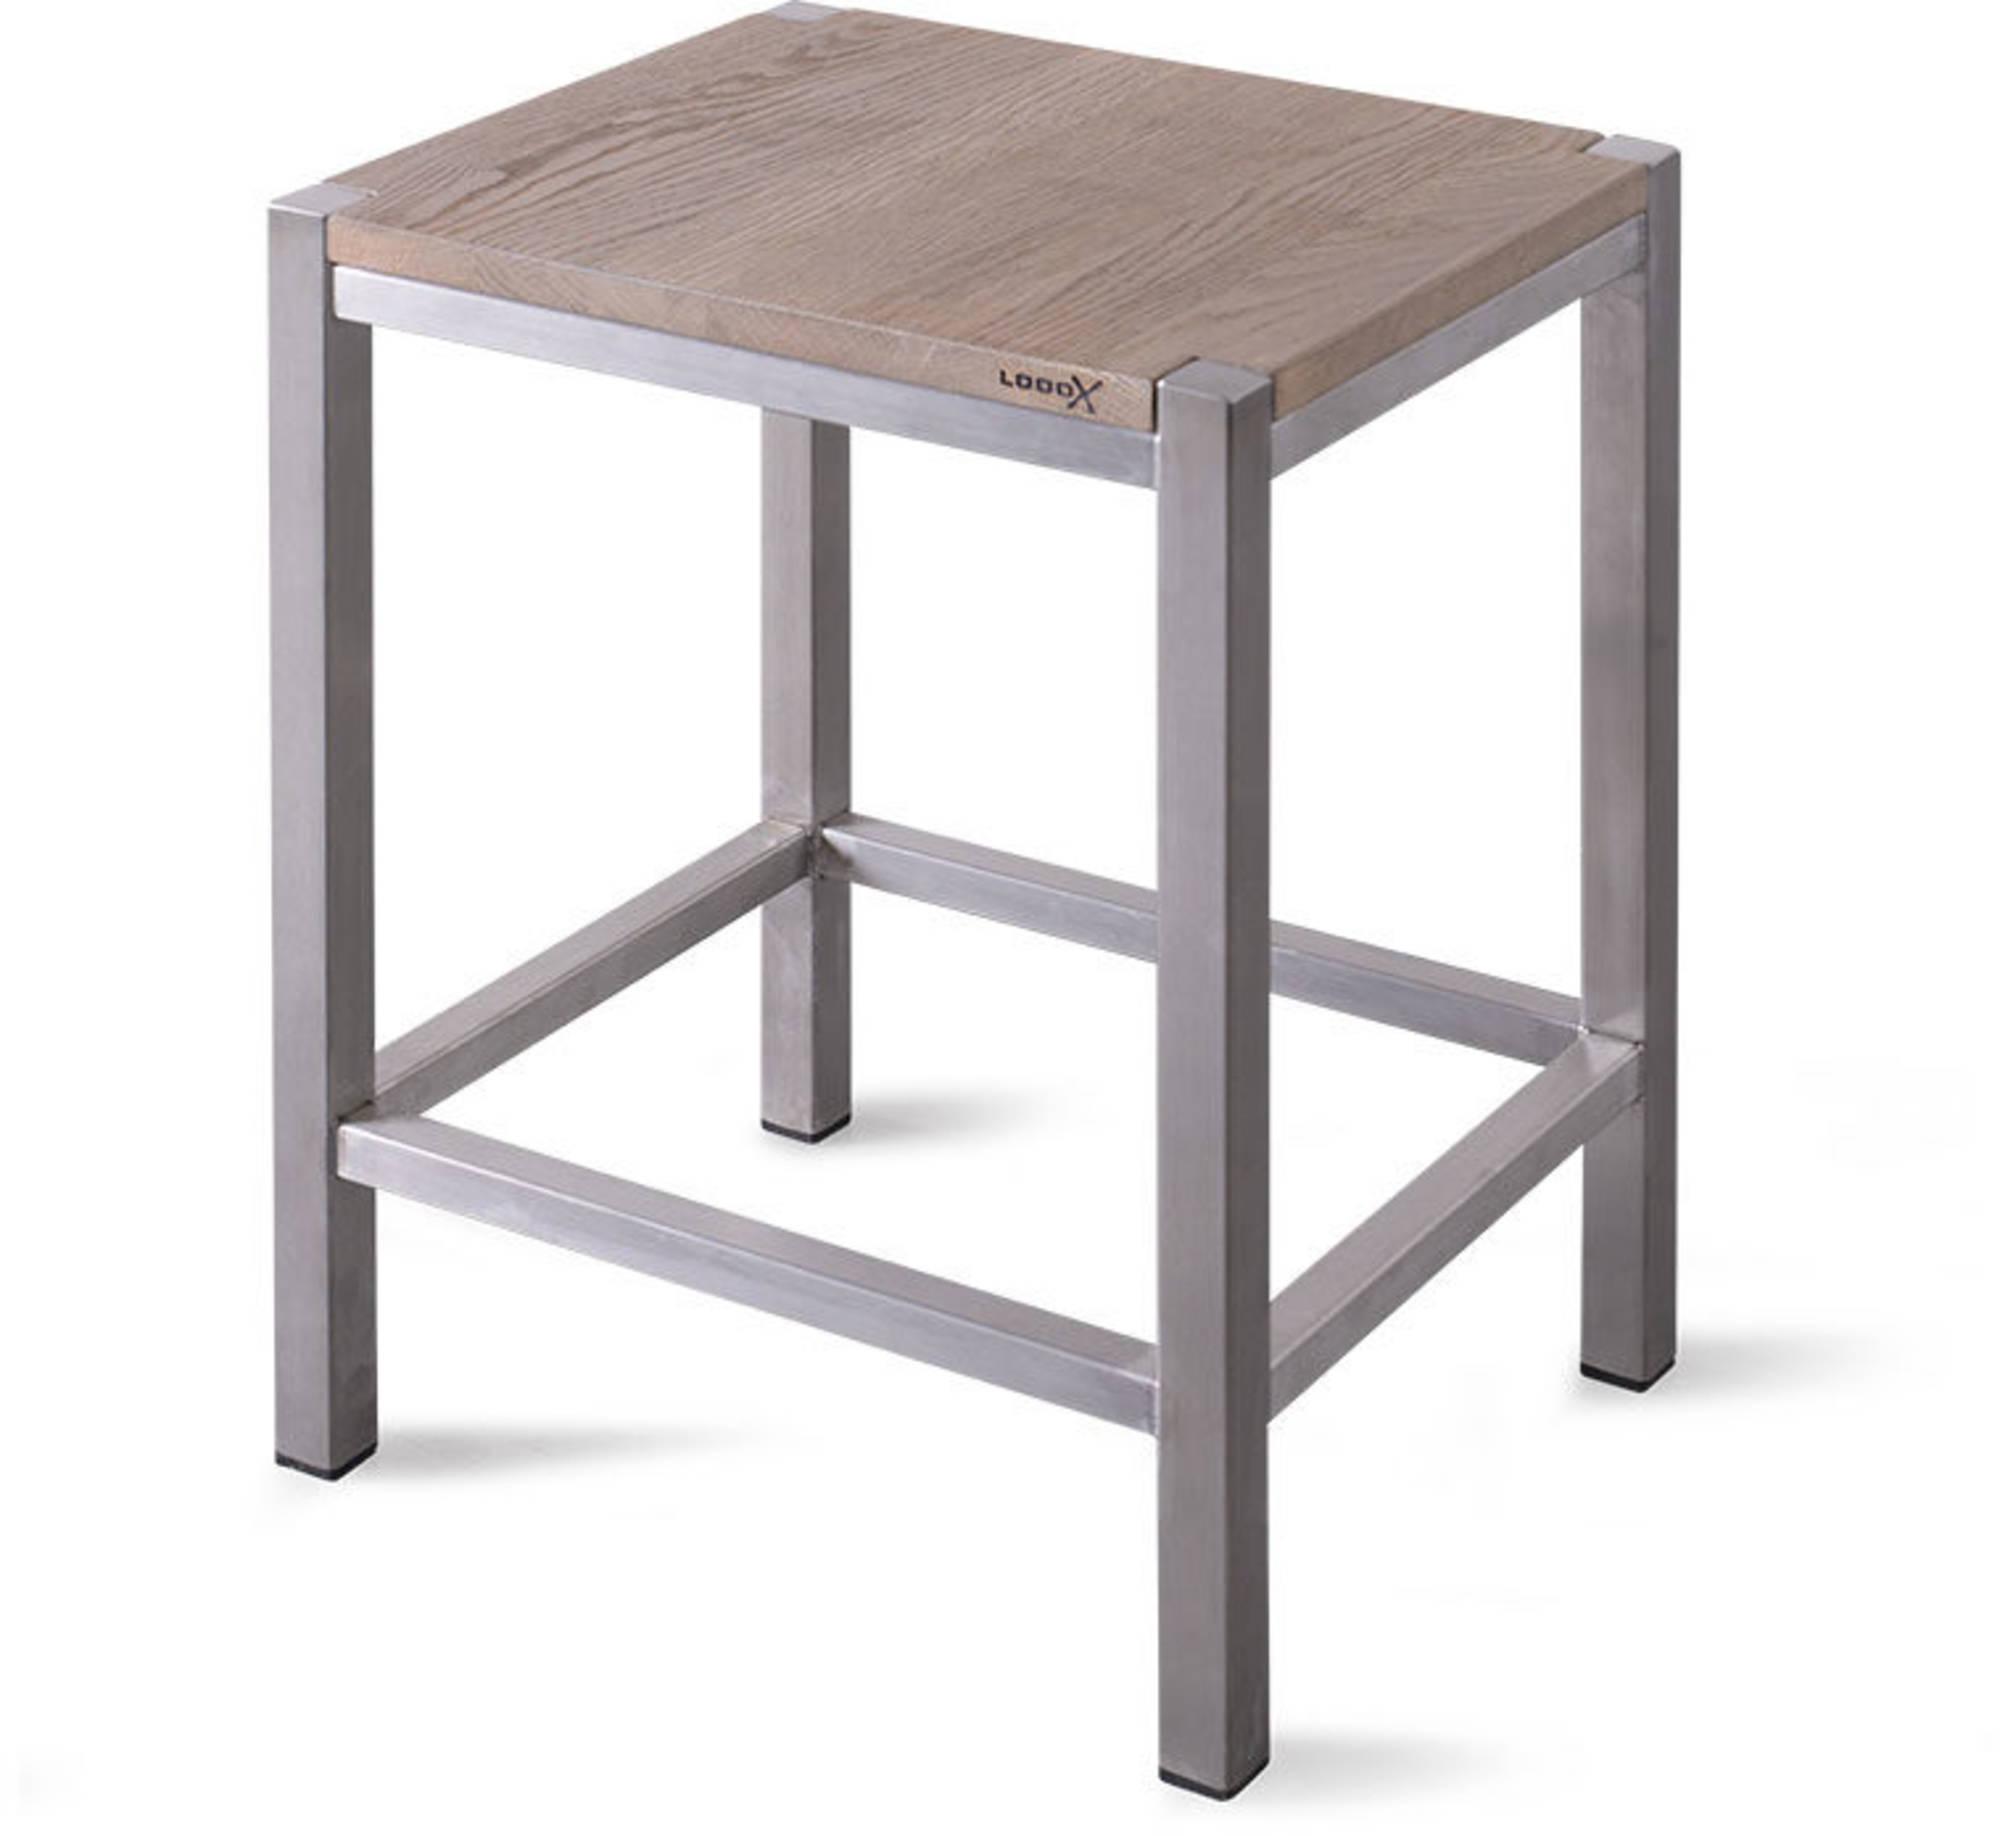 Looox Wooden Collection douche stool met frame geborsteld rvs/eiken